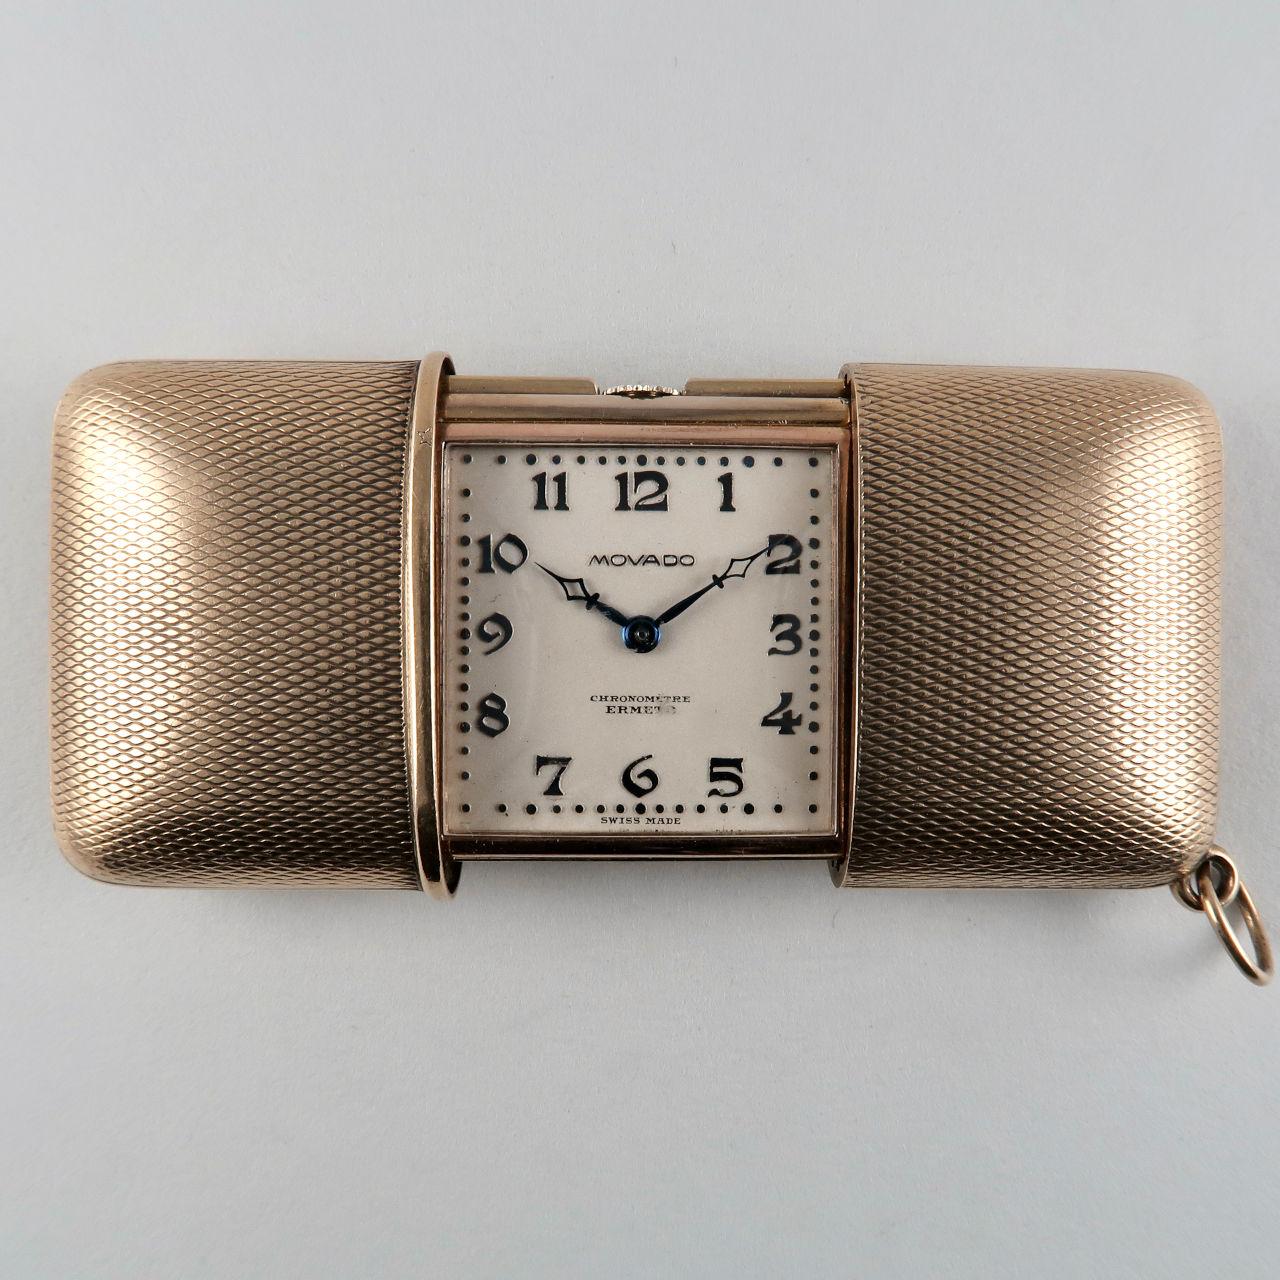 Movado Ermeto hallmarked 1929 | silver gilt purse watch